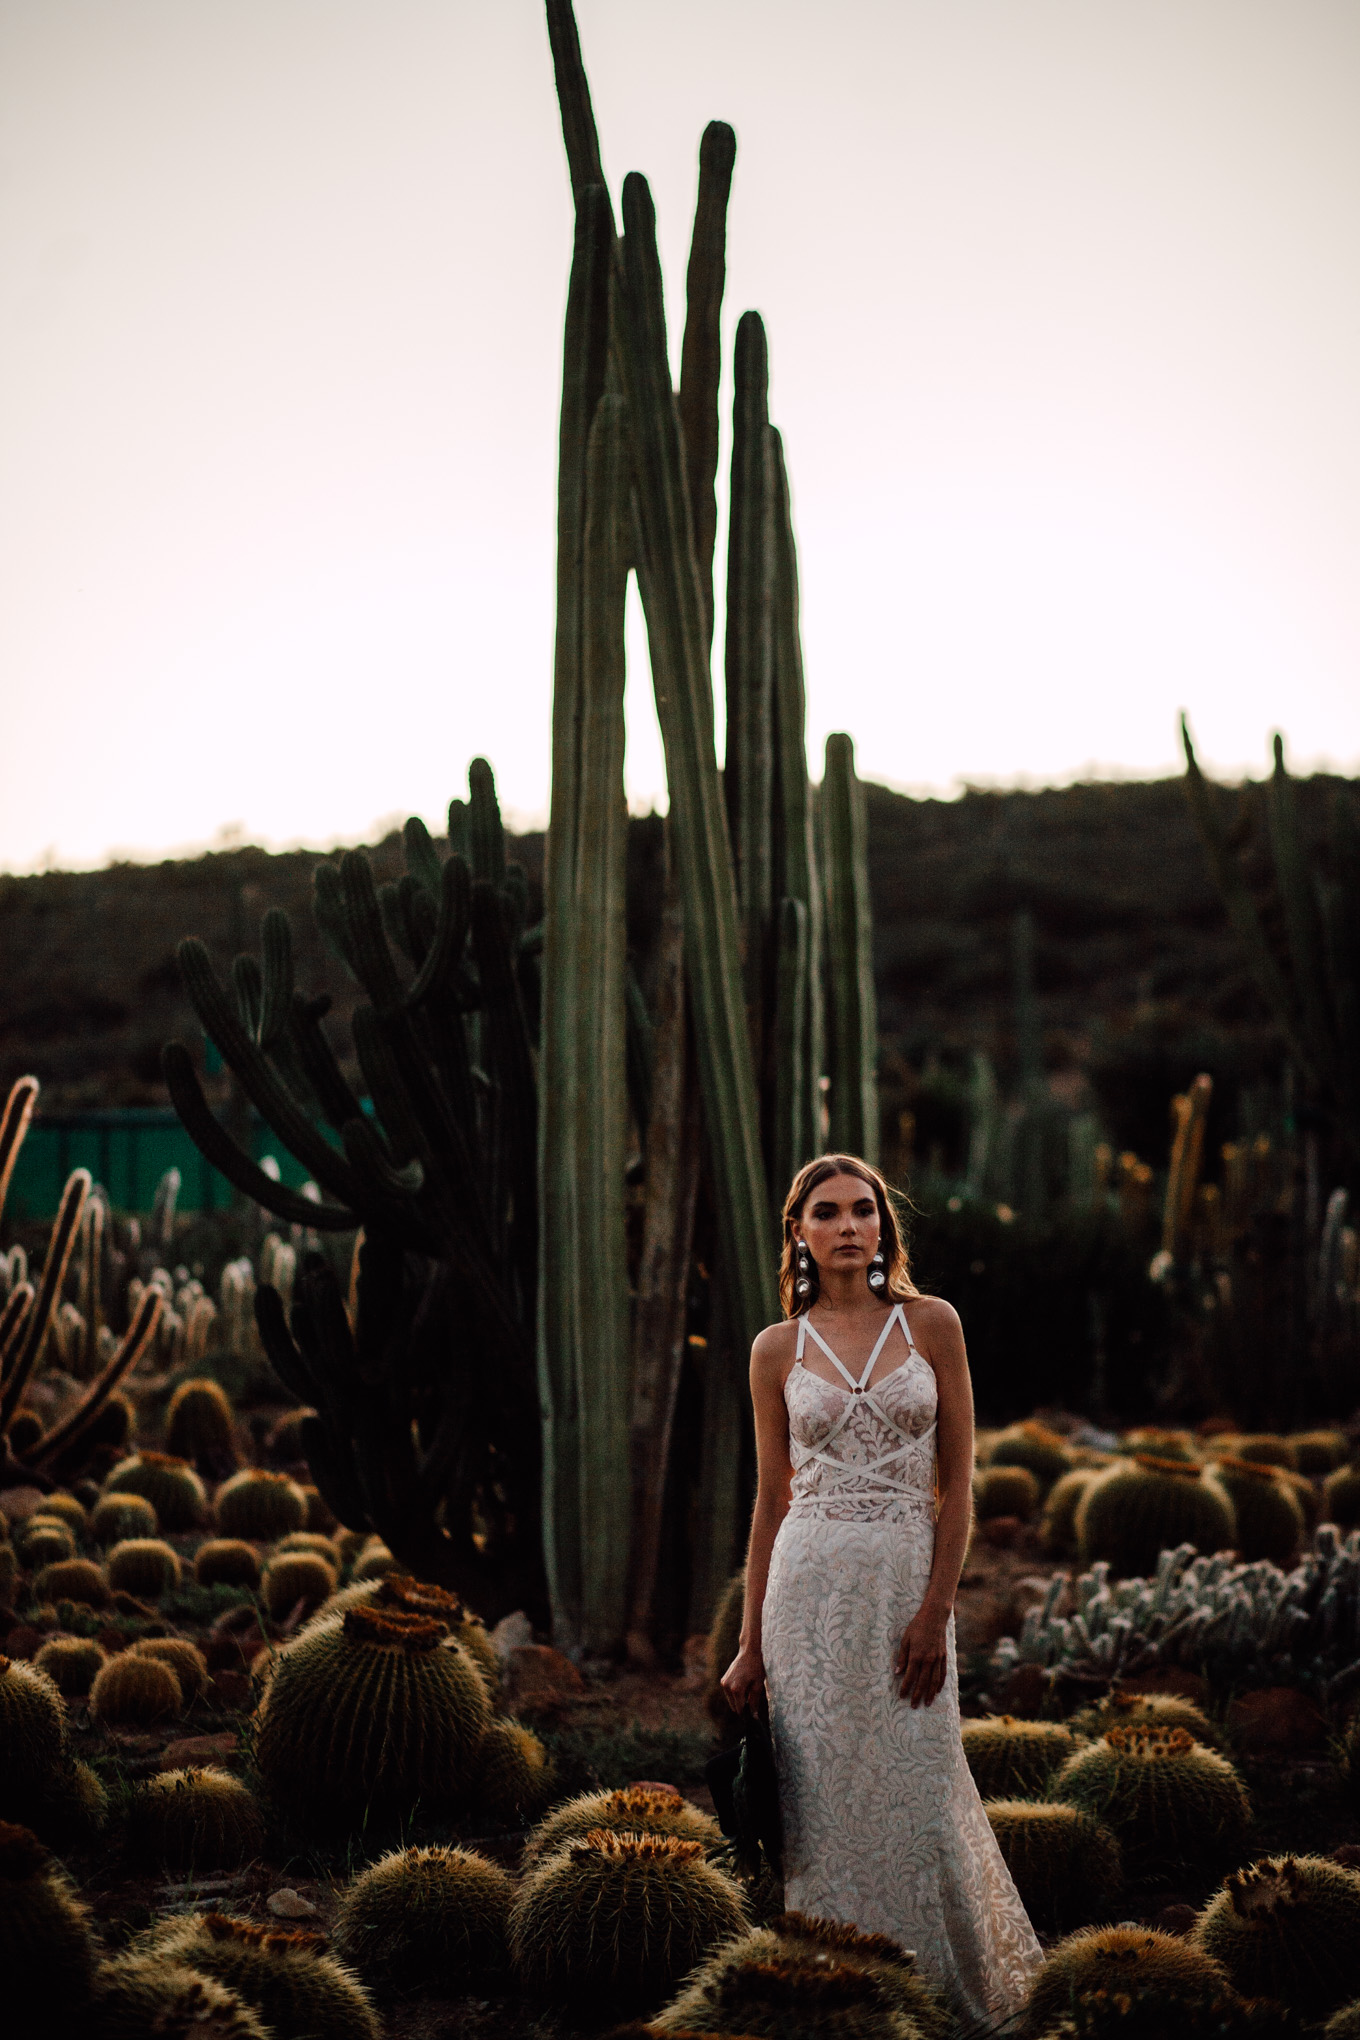 Cape-Town-Pia-Anna-Christian-Wedding-Photography-South-Africa-Bride-Cactus-41.jpg